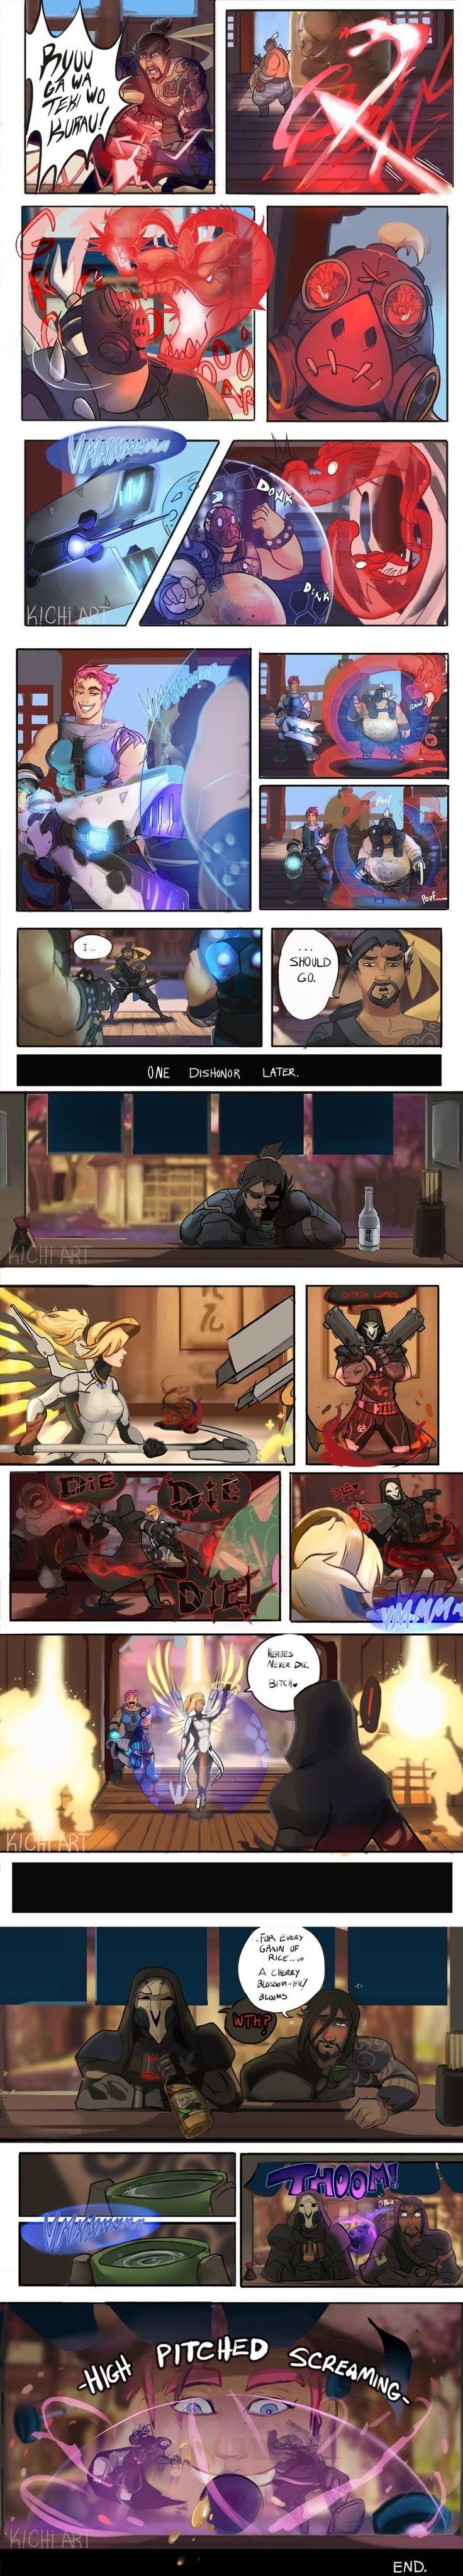 Overwatch,Blizzard,Blizzard Entertainment,фэндомы,Overwatch Comics,Zarya,Hanzo,D.Va,Roadhog,Mercy (Overwatch),Reaper (Overwatch),Winston (Overwatch)